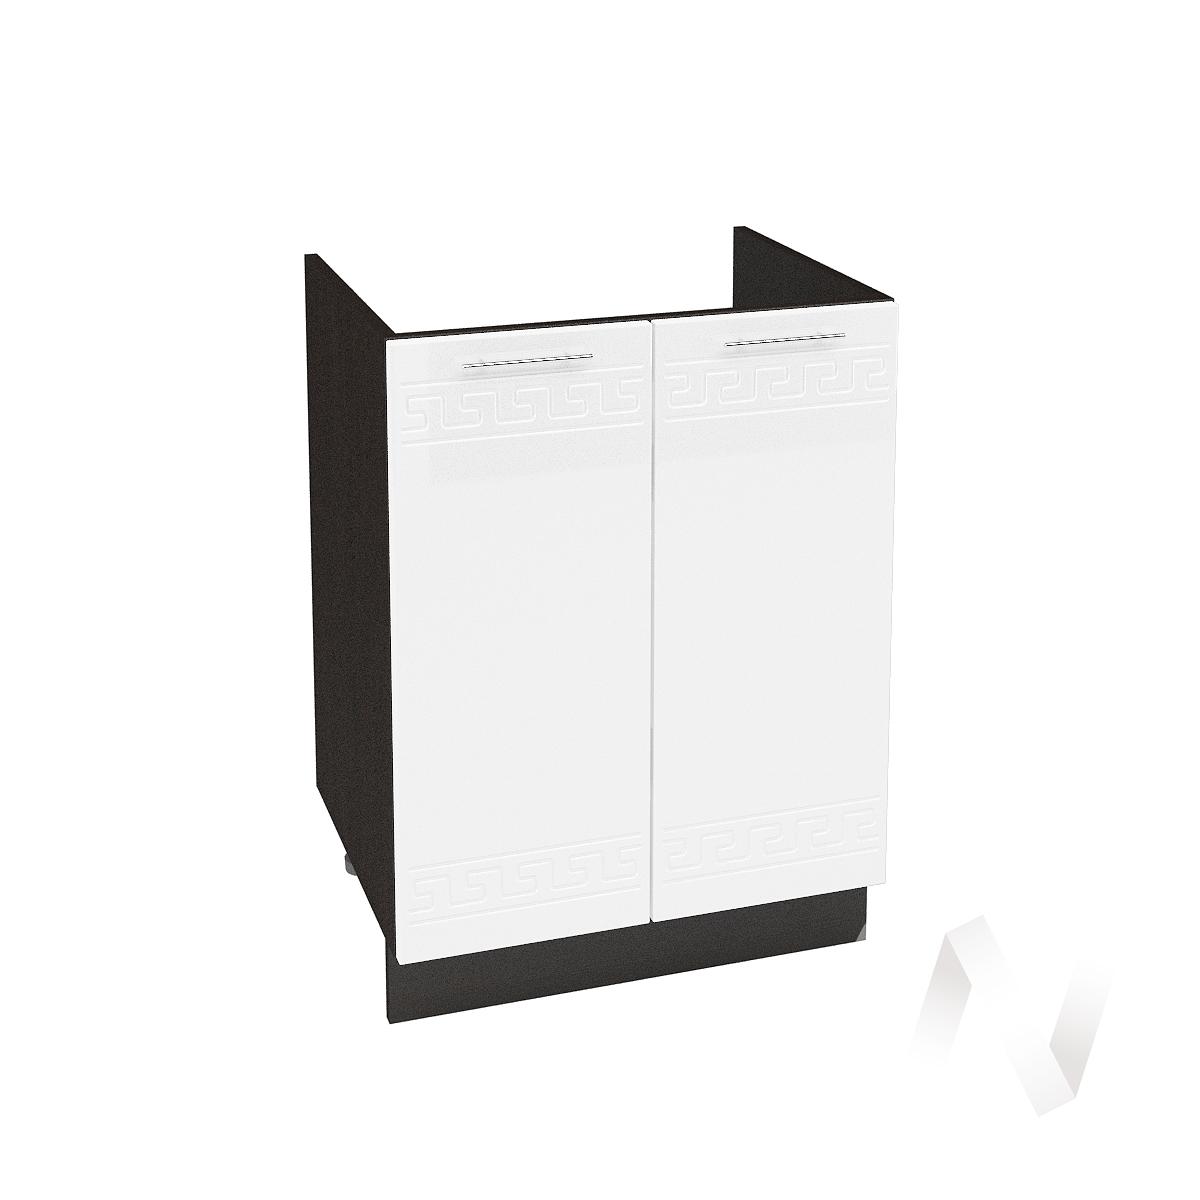 "Кухня ""Греция"": Шкаф нижний под мойку 600, ШНМ 600 (белый металлик/корпус венге)"